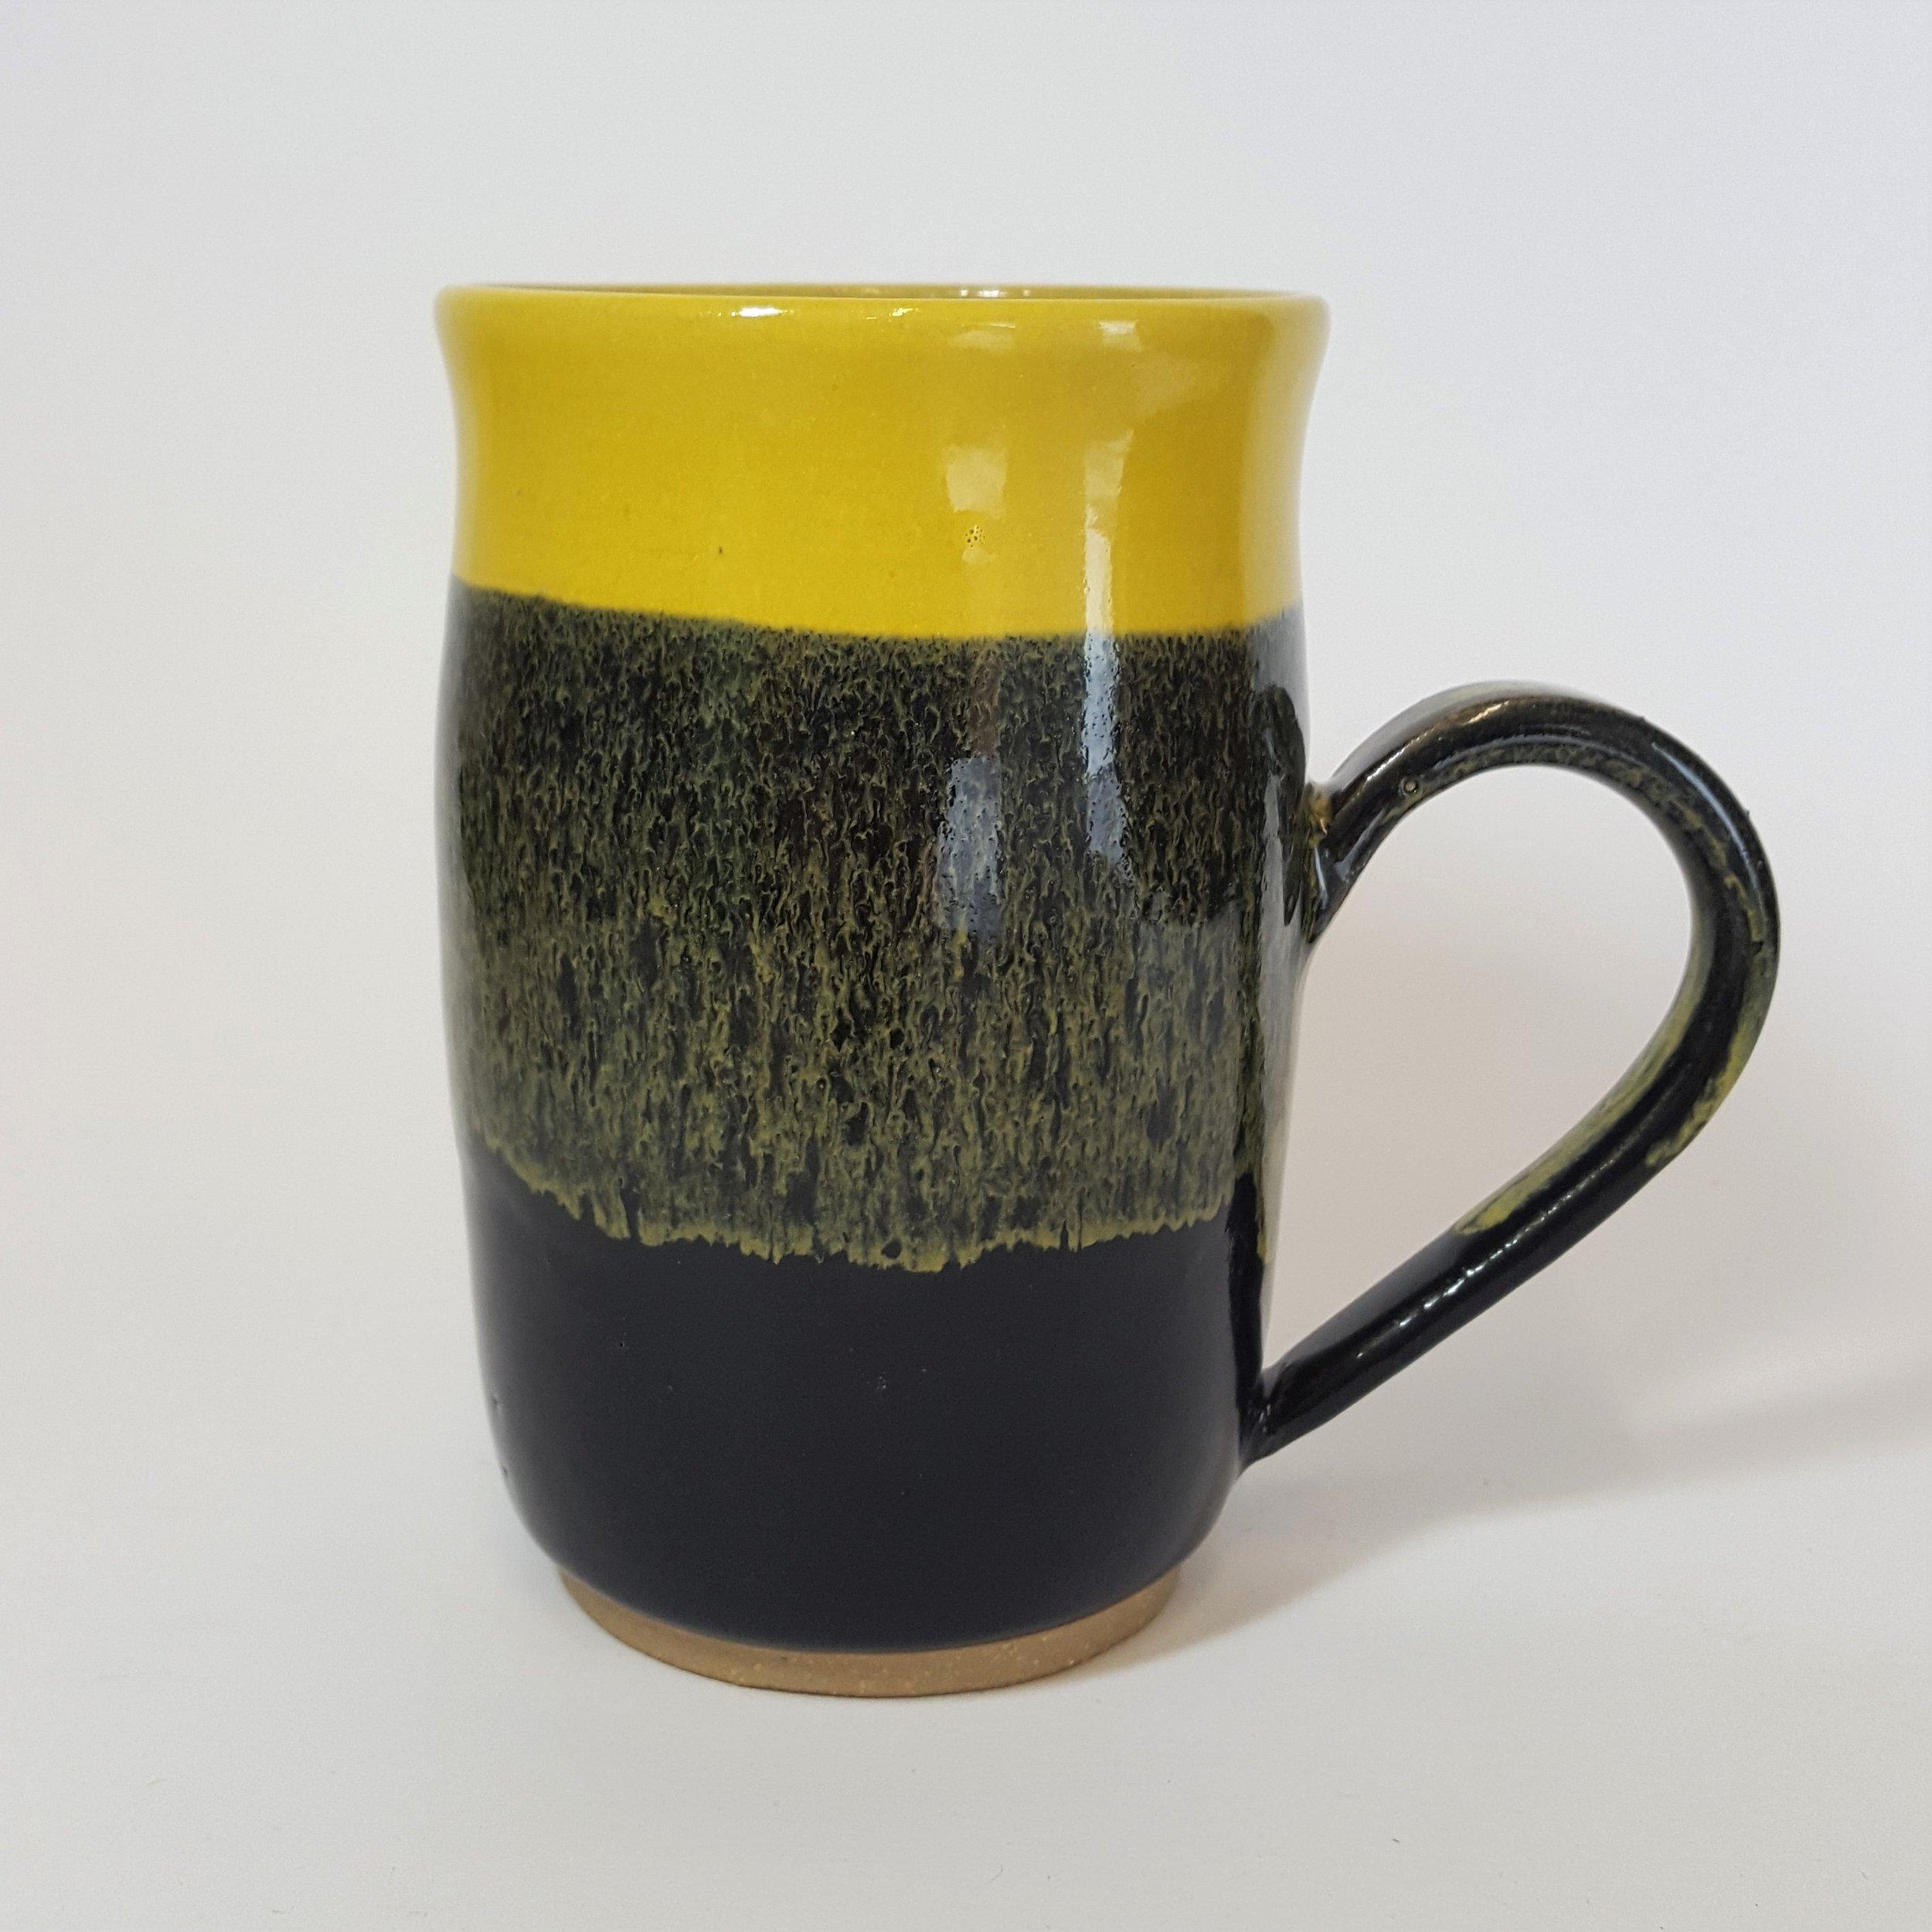 17 oz. Humble Badger Mug - $28